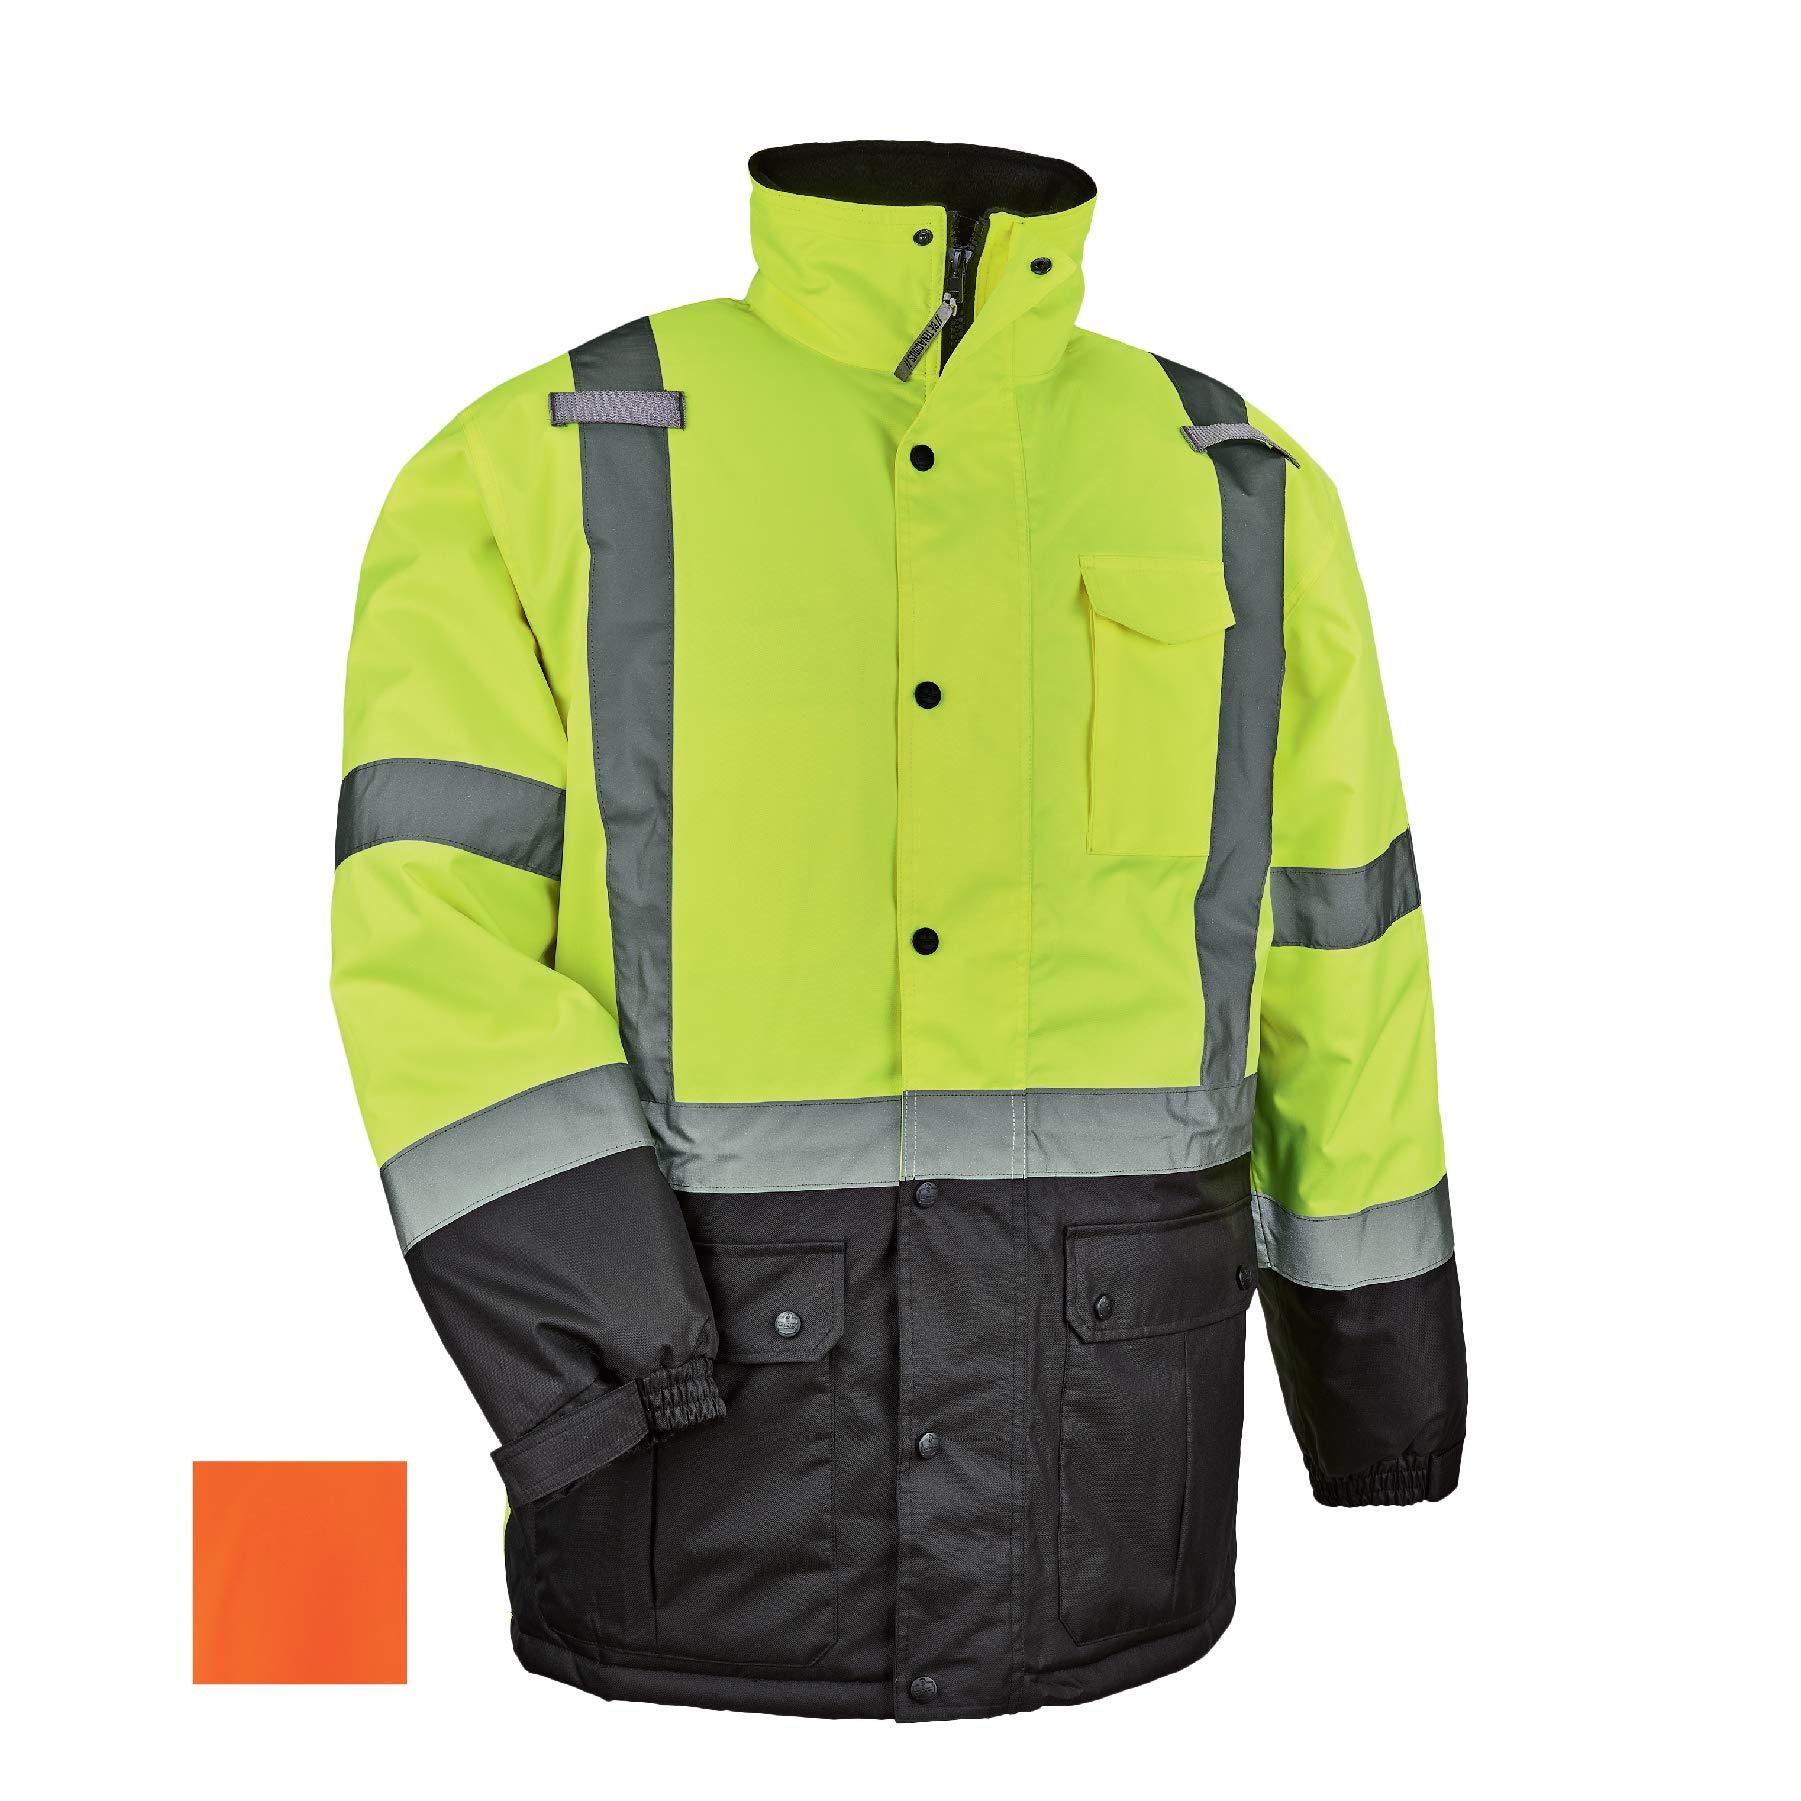 High Visibility Reflective Winter Safety Jacket, Insulated Parka, ANSI Compliant, Ergodyne GloWear 8384 by Ergodyne